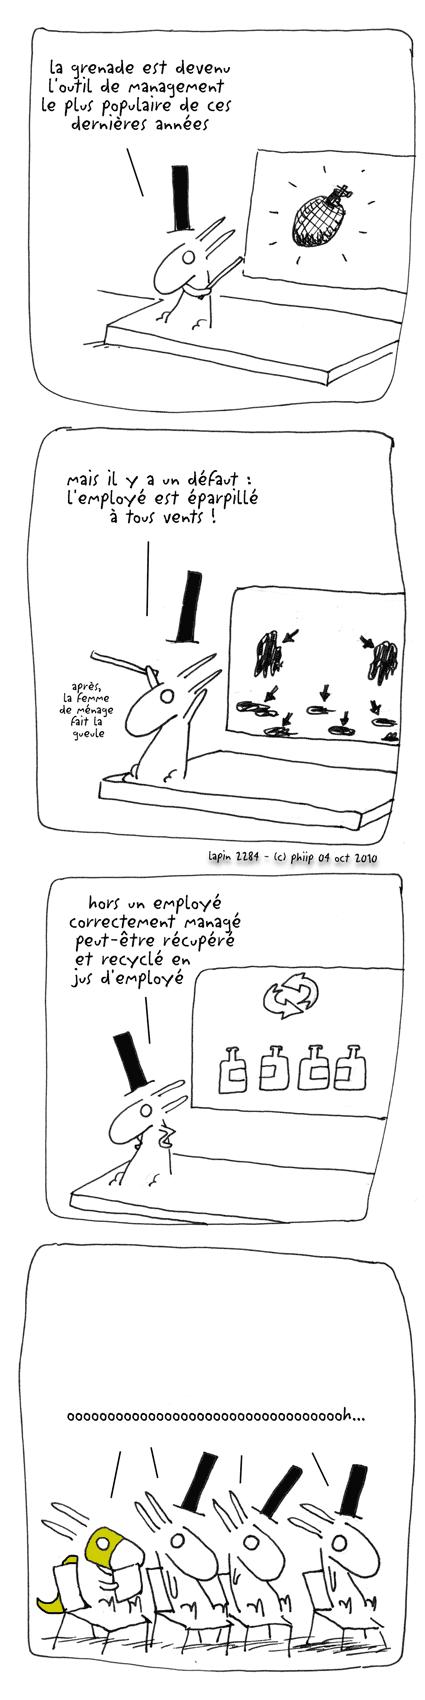 éparpillé